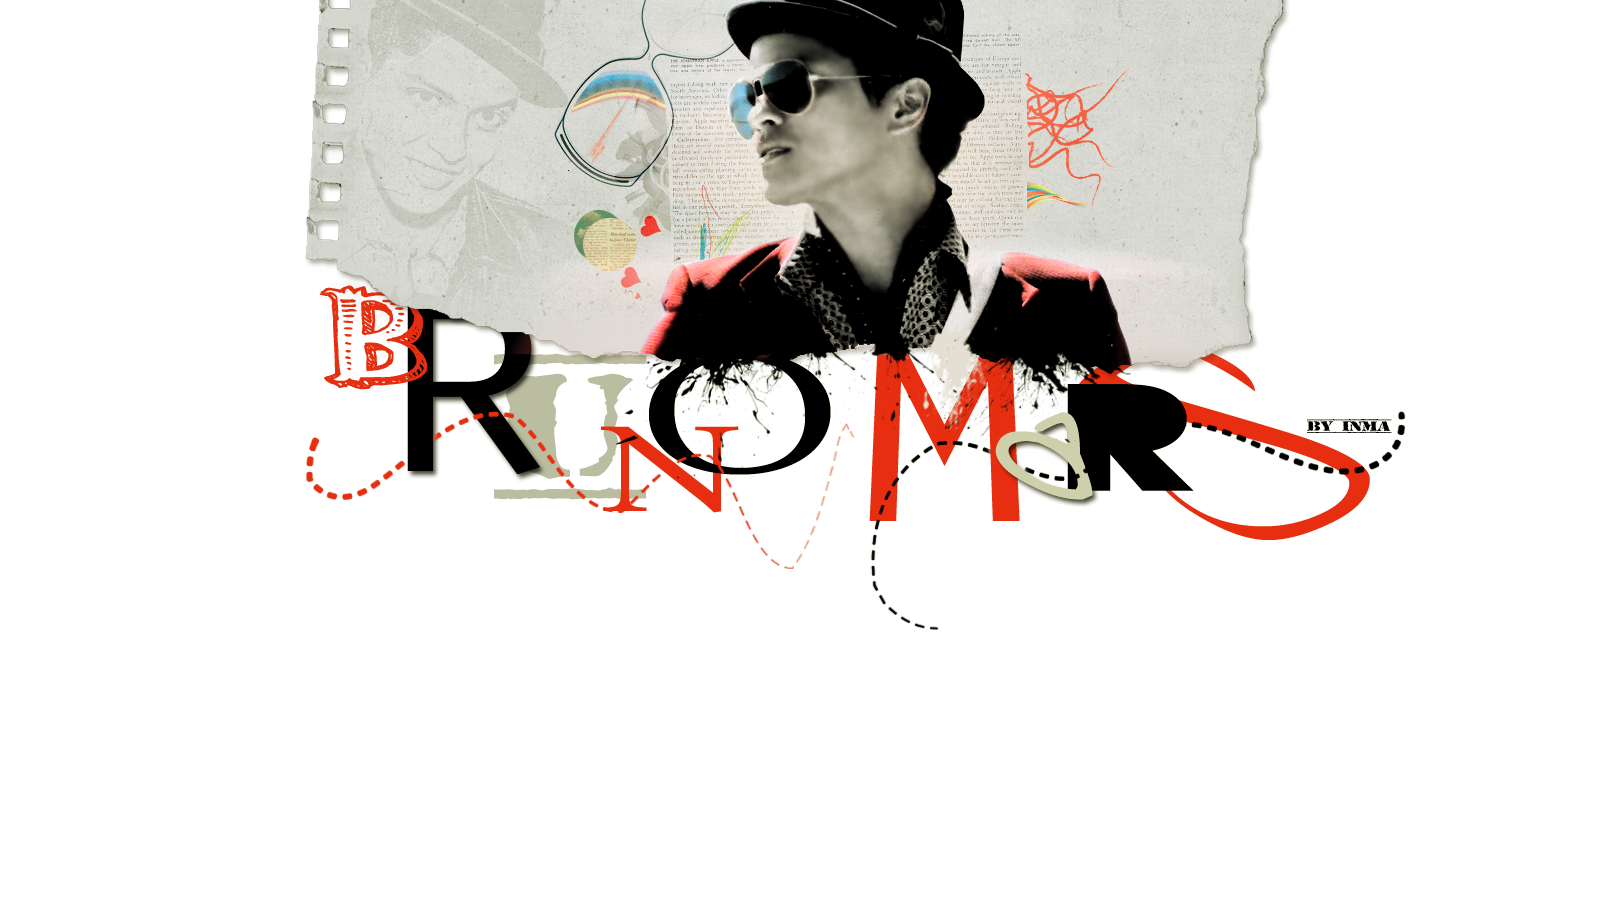 Bruno Mars Wallpaper By Inmany On DeviantArt